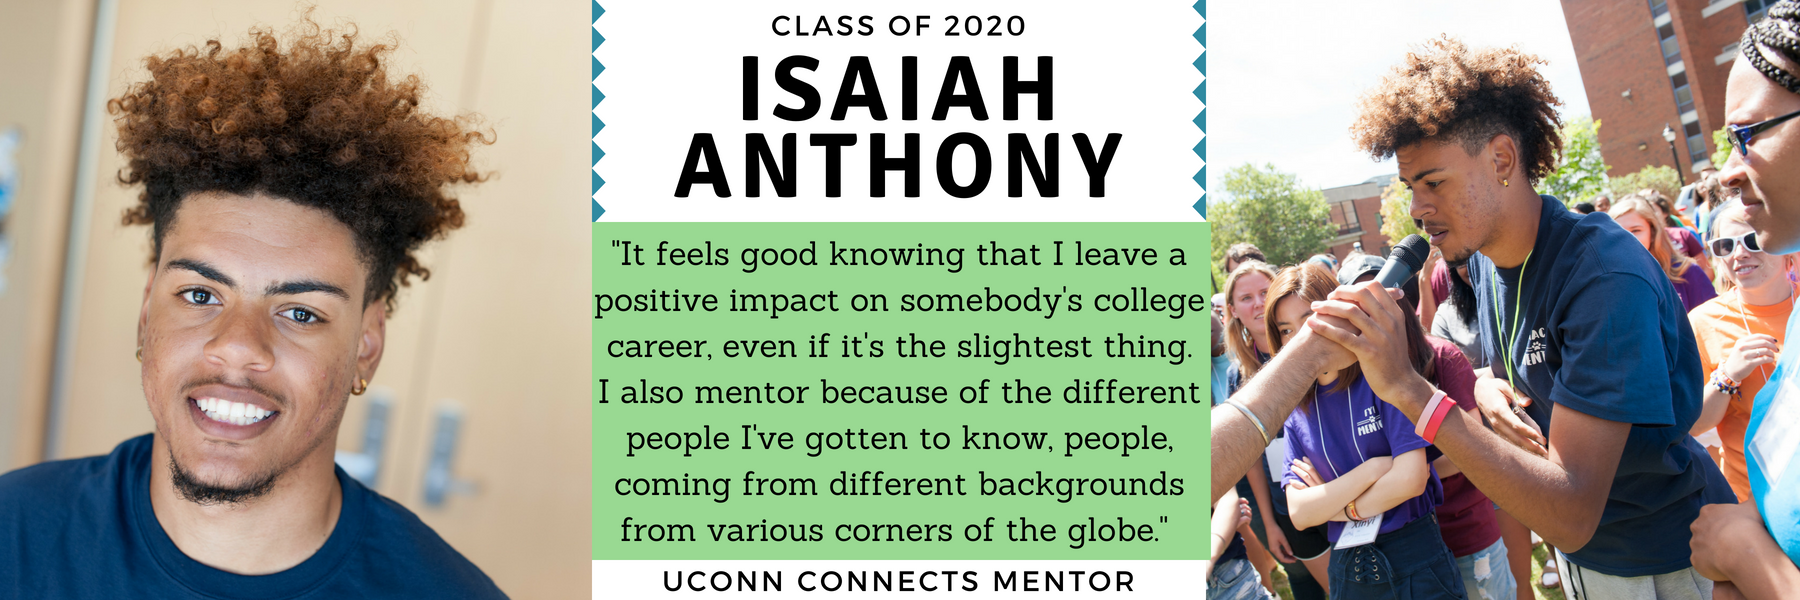 Isaiah Anthony Why I mentor